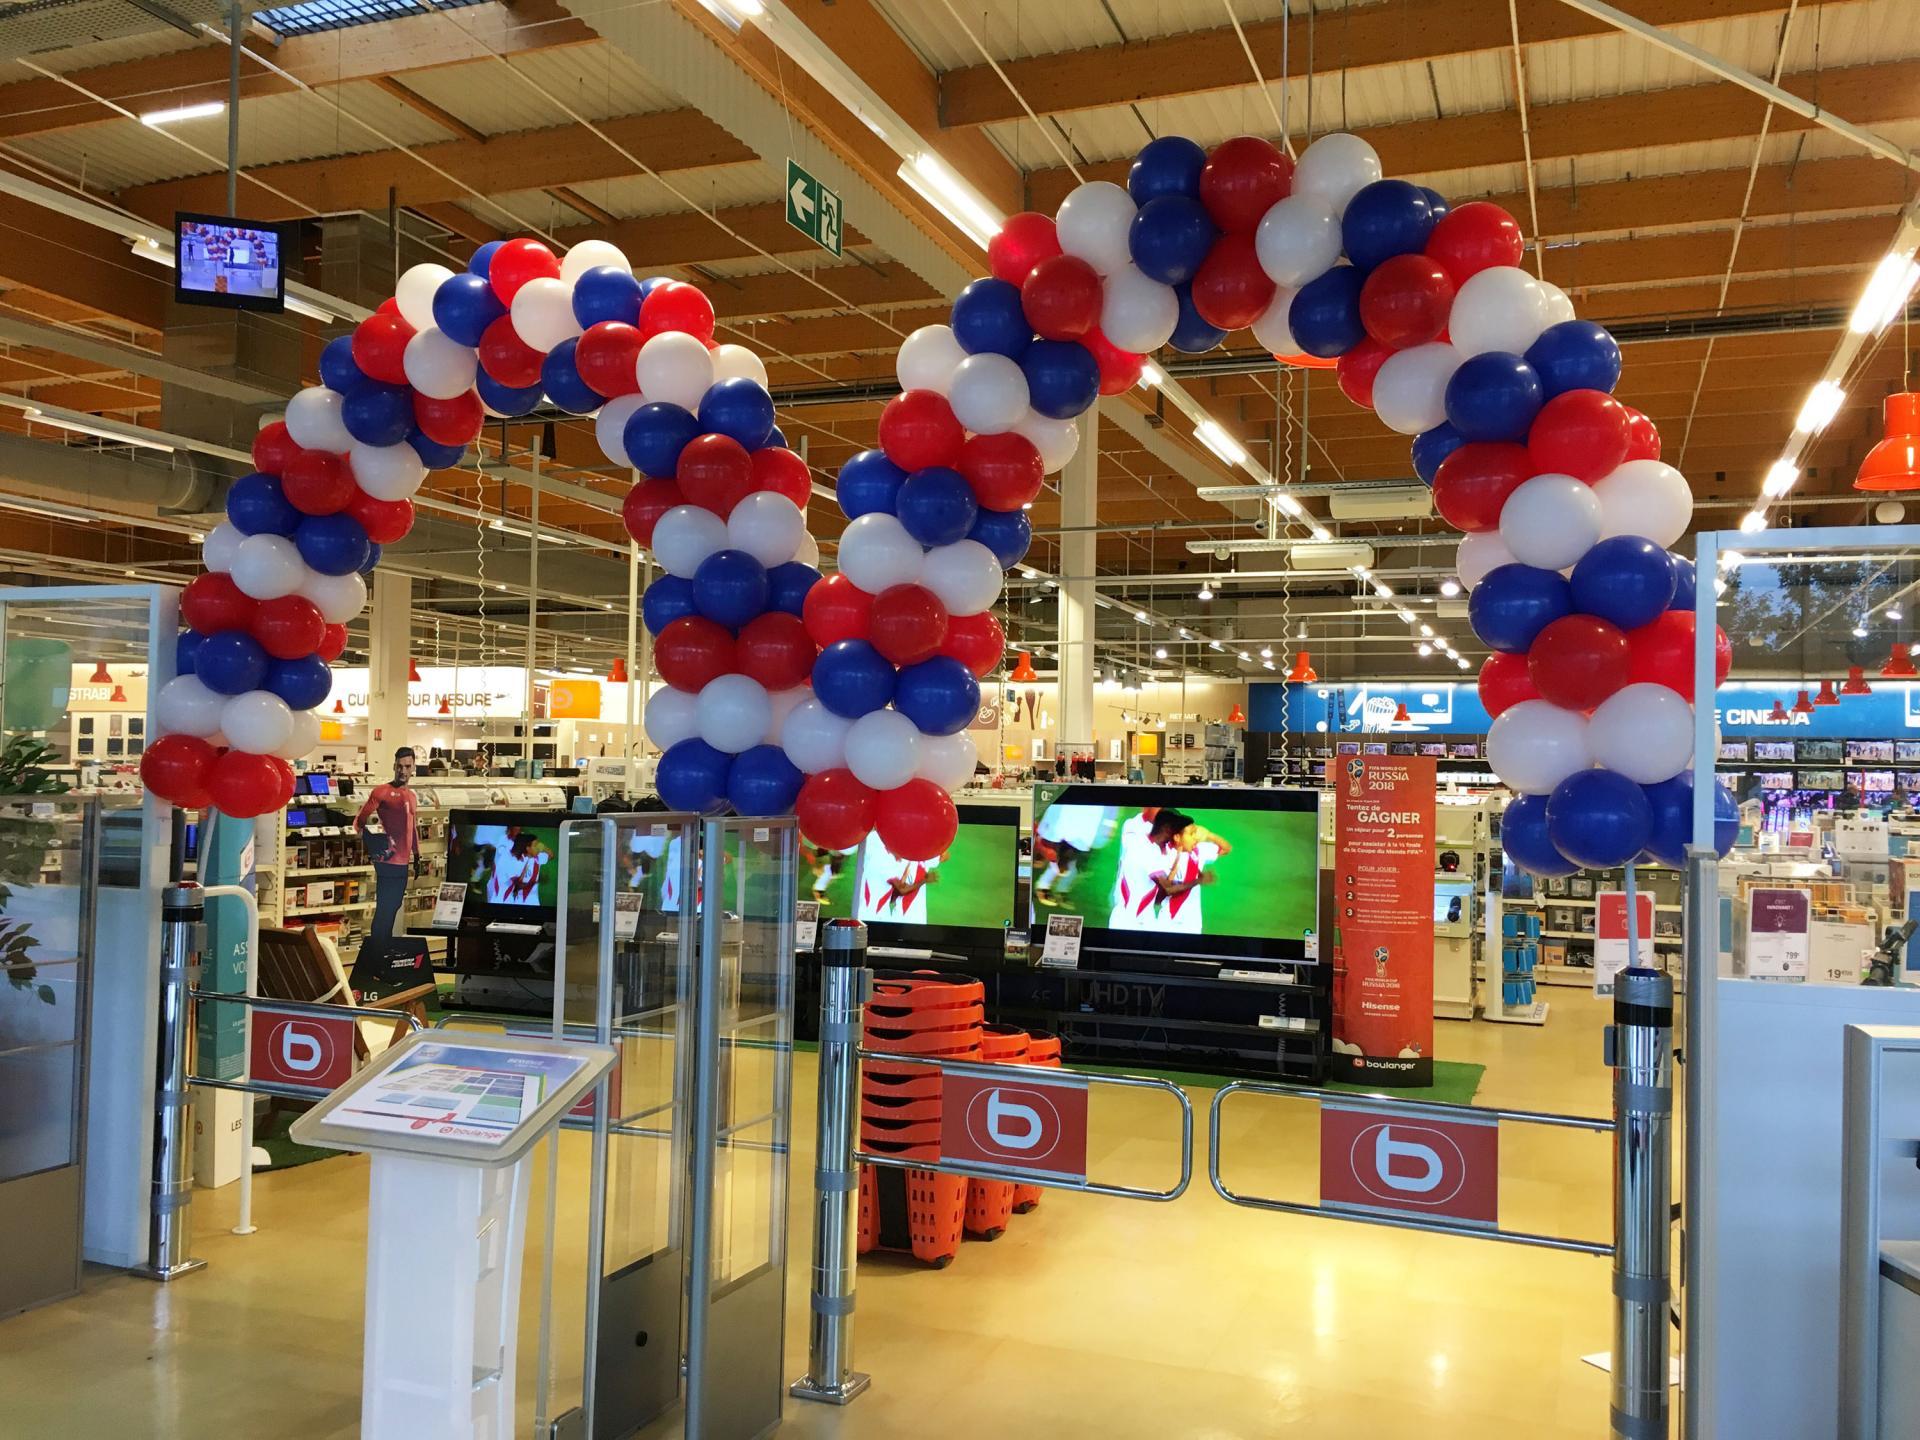 Arche Ballons entrée magasin